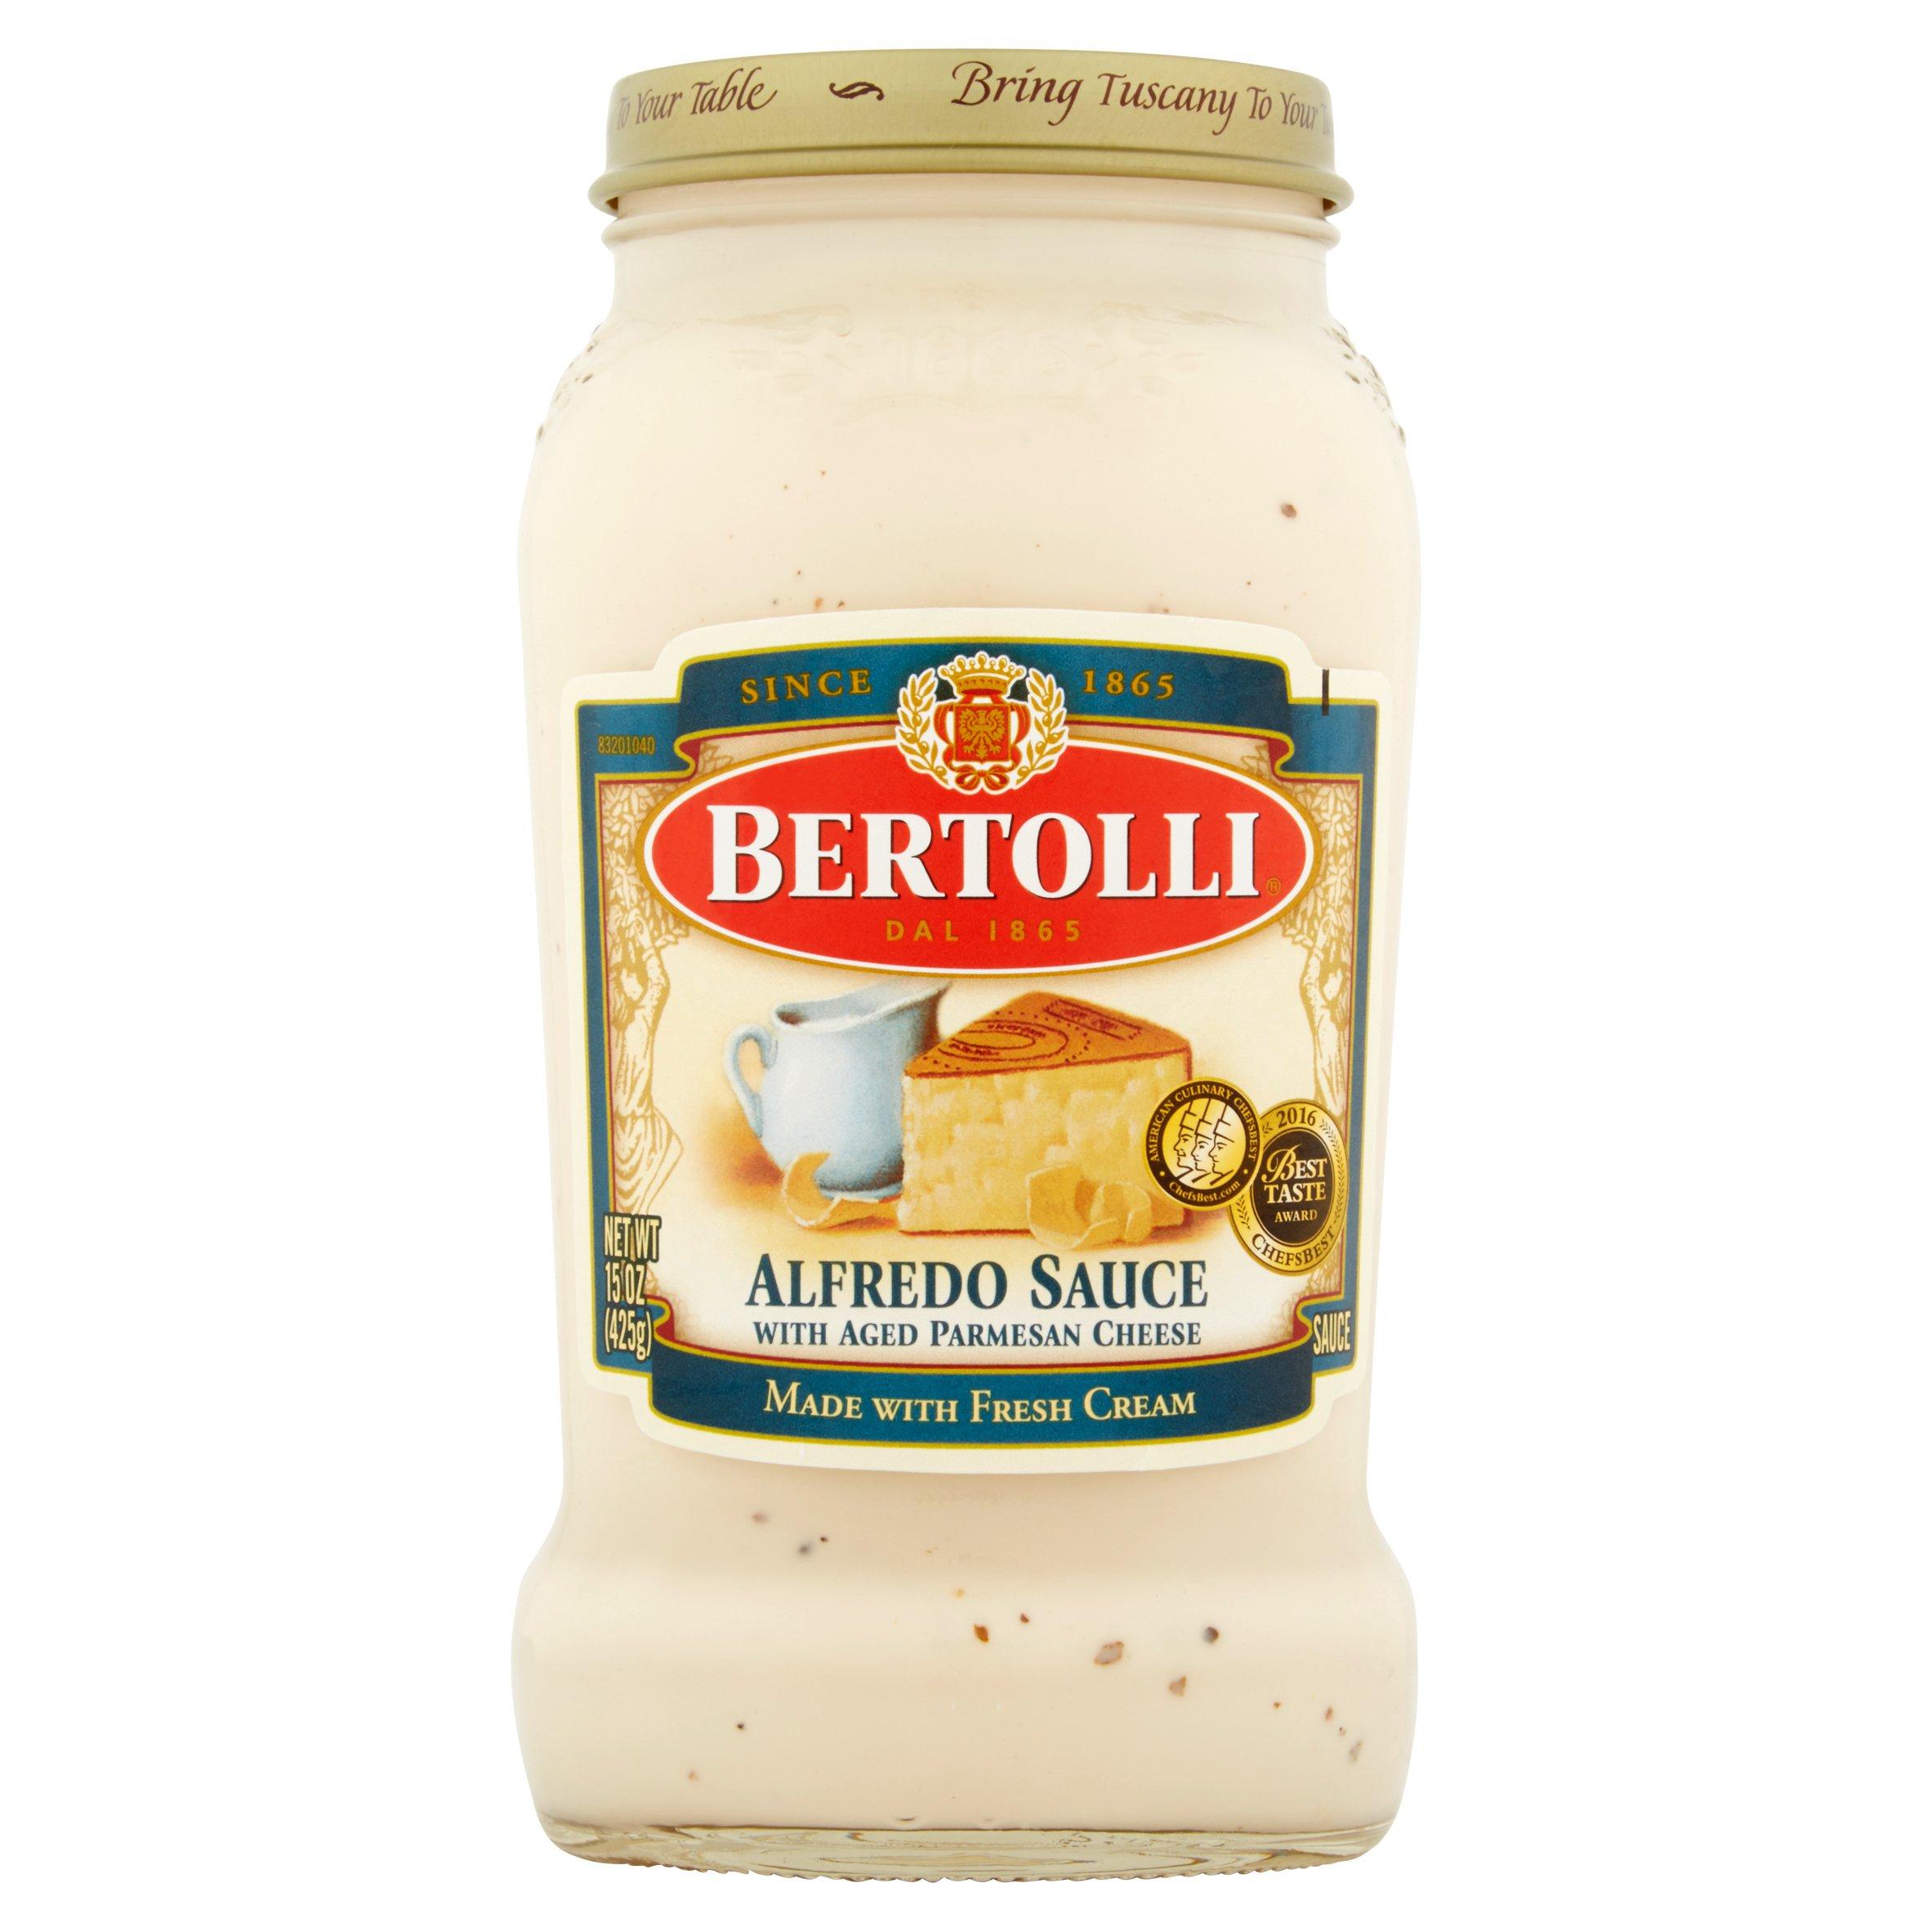 (2 pack) Bertolli Alfredo Sauce 15 oz